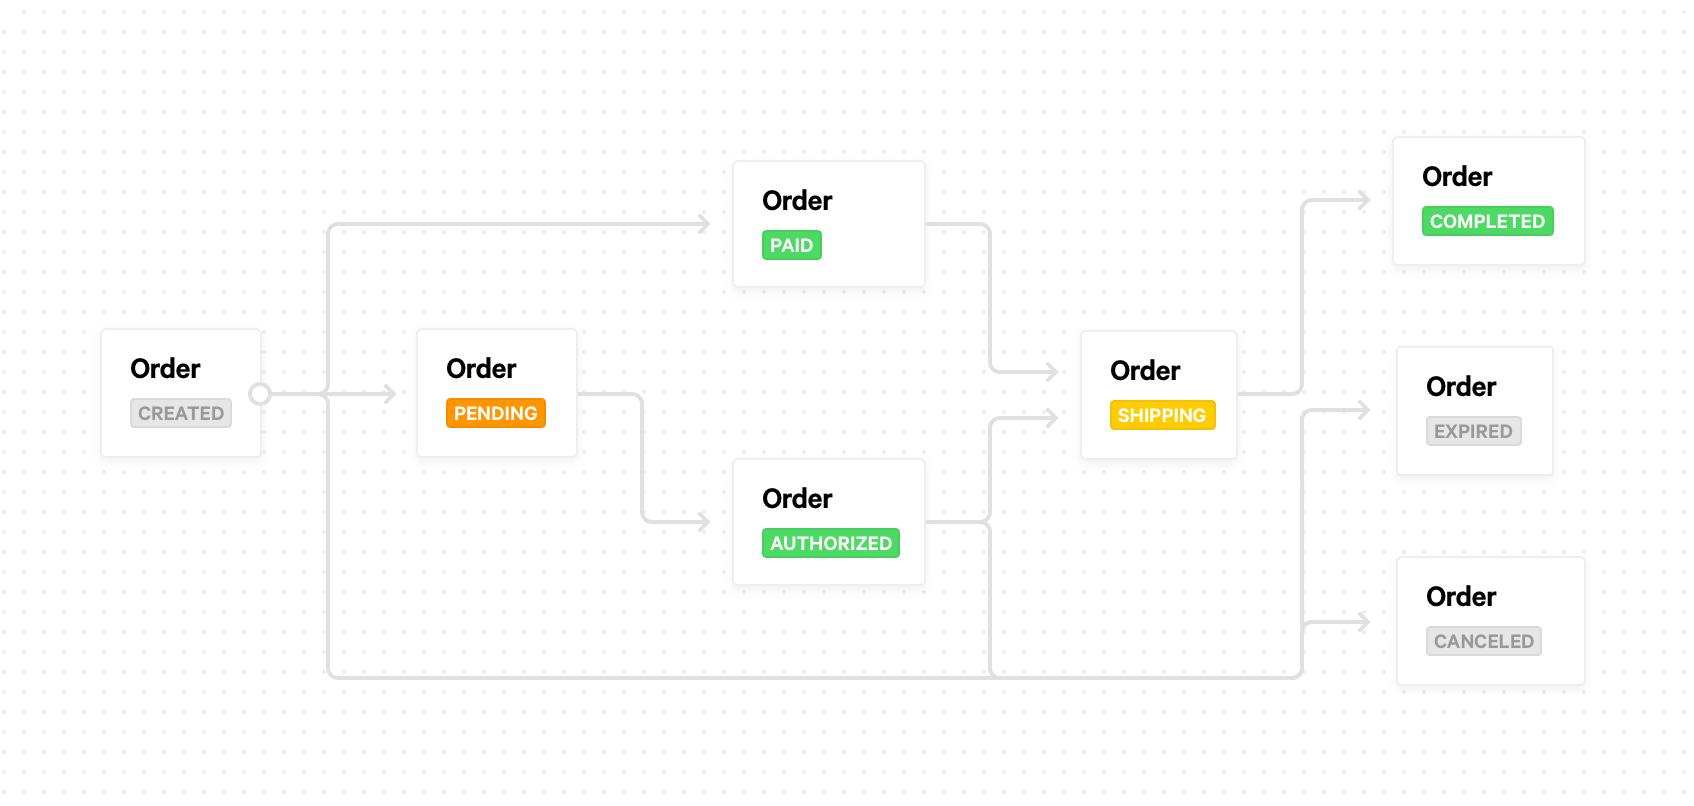 https://assets.docs.mollie.com/_images/order-status-flow@2x.png